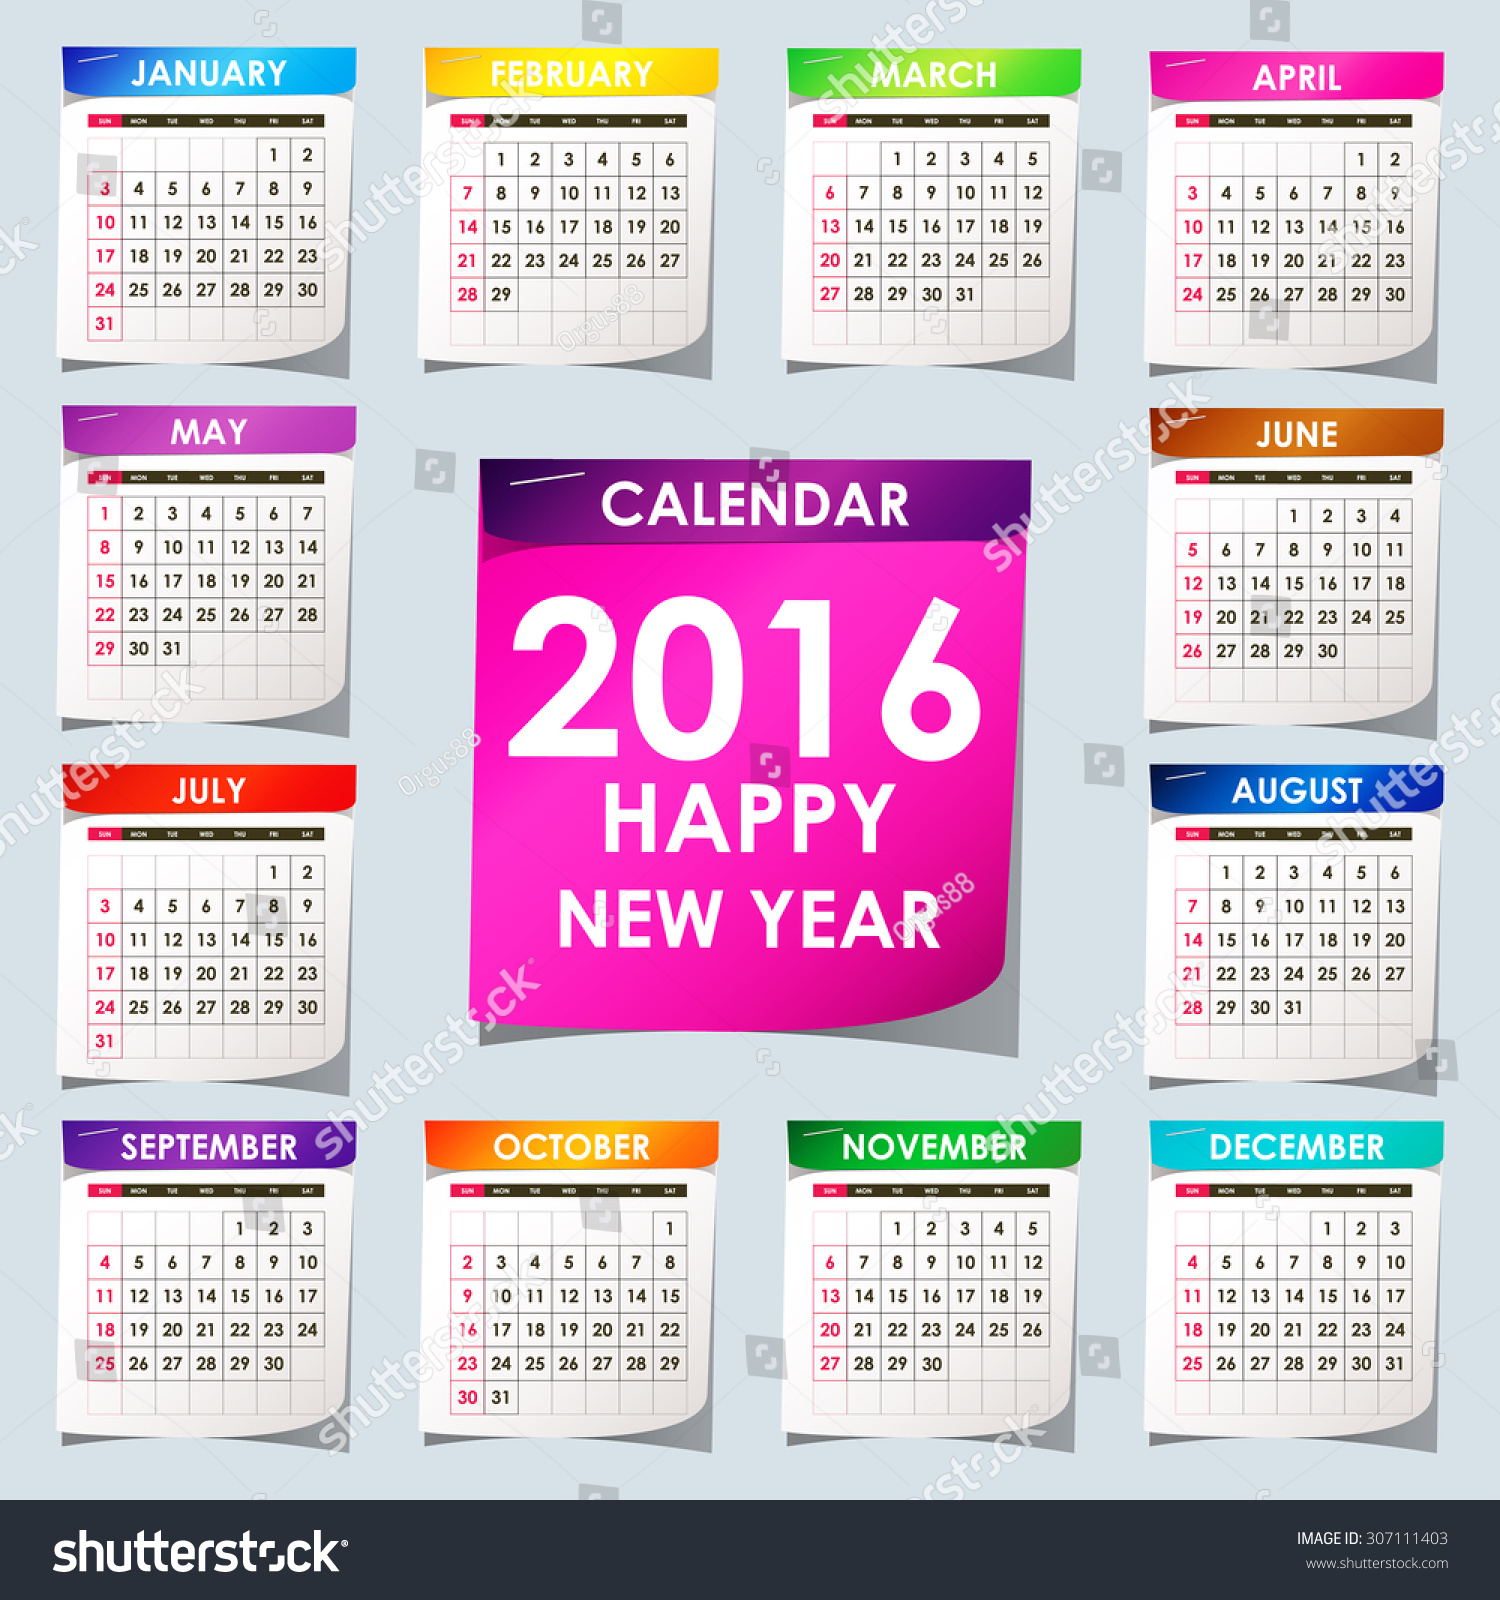 Calendar Design Html : Simple calendar design